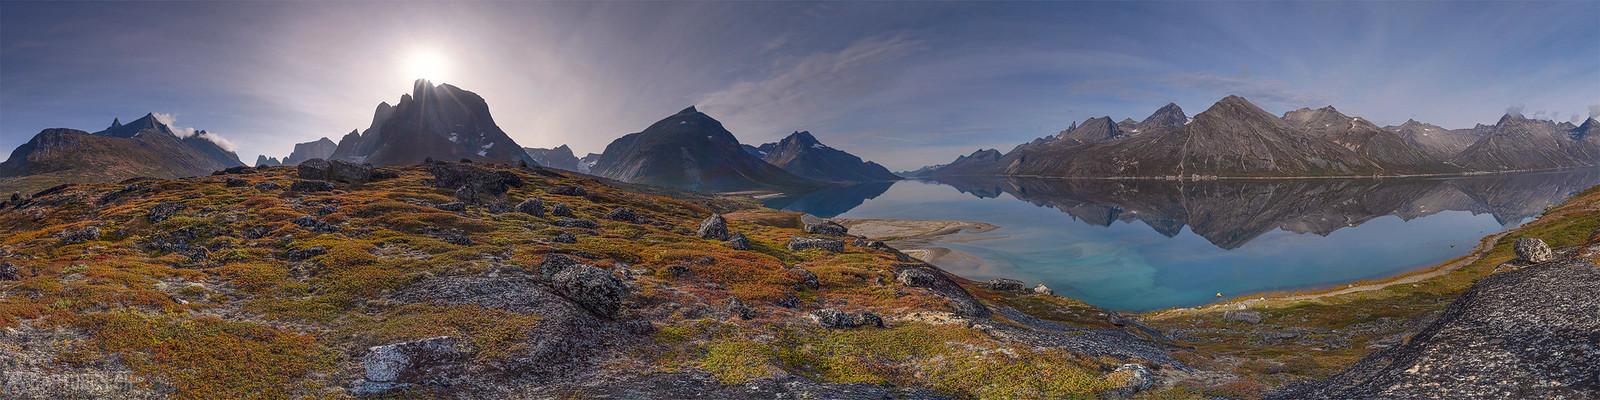 Fjord panorama - Tasermiut